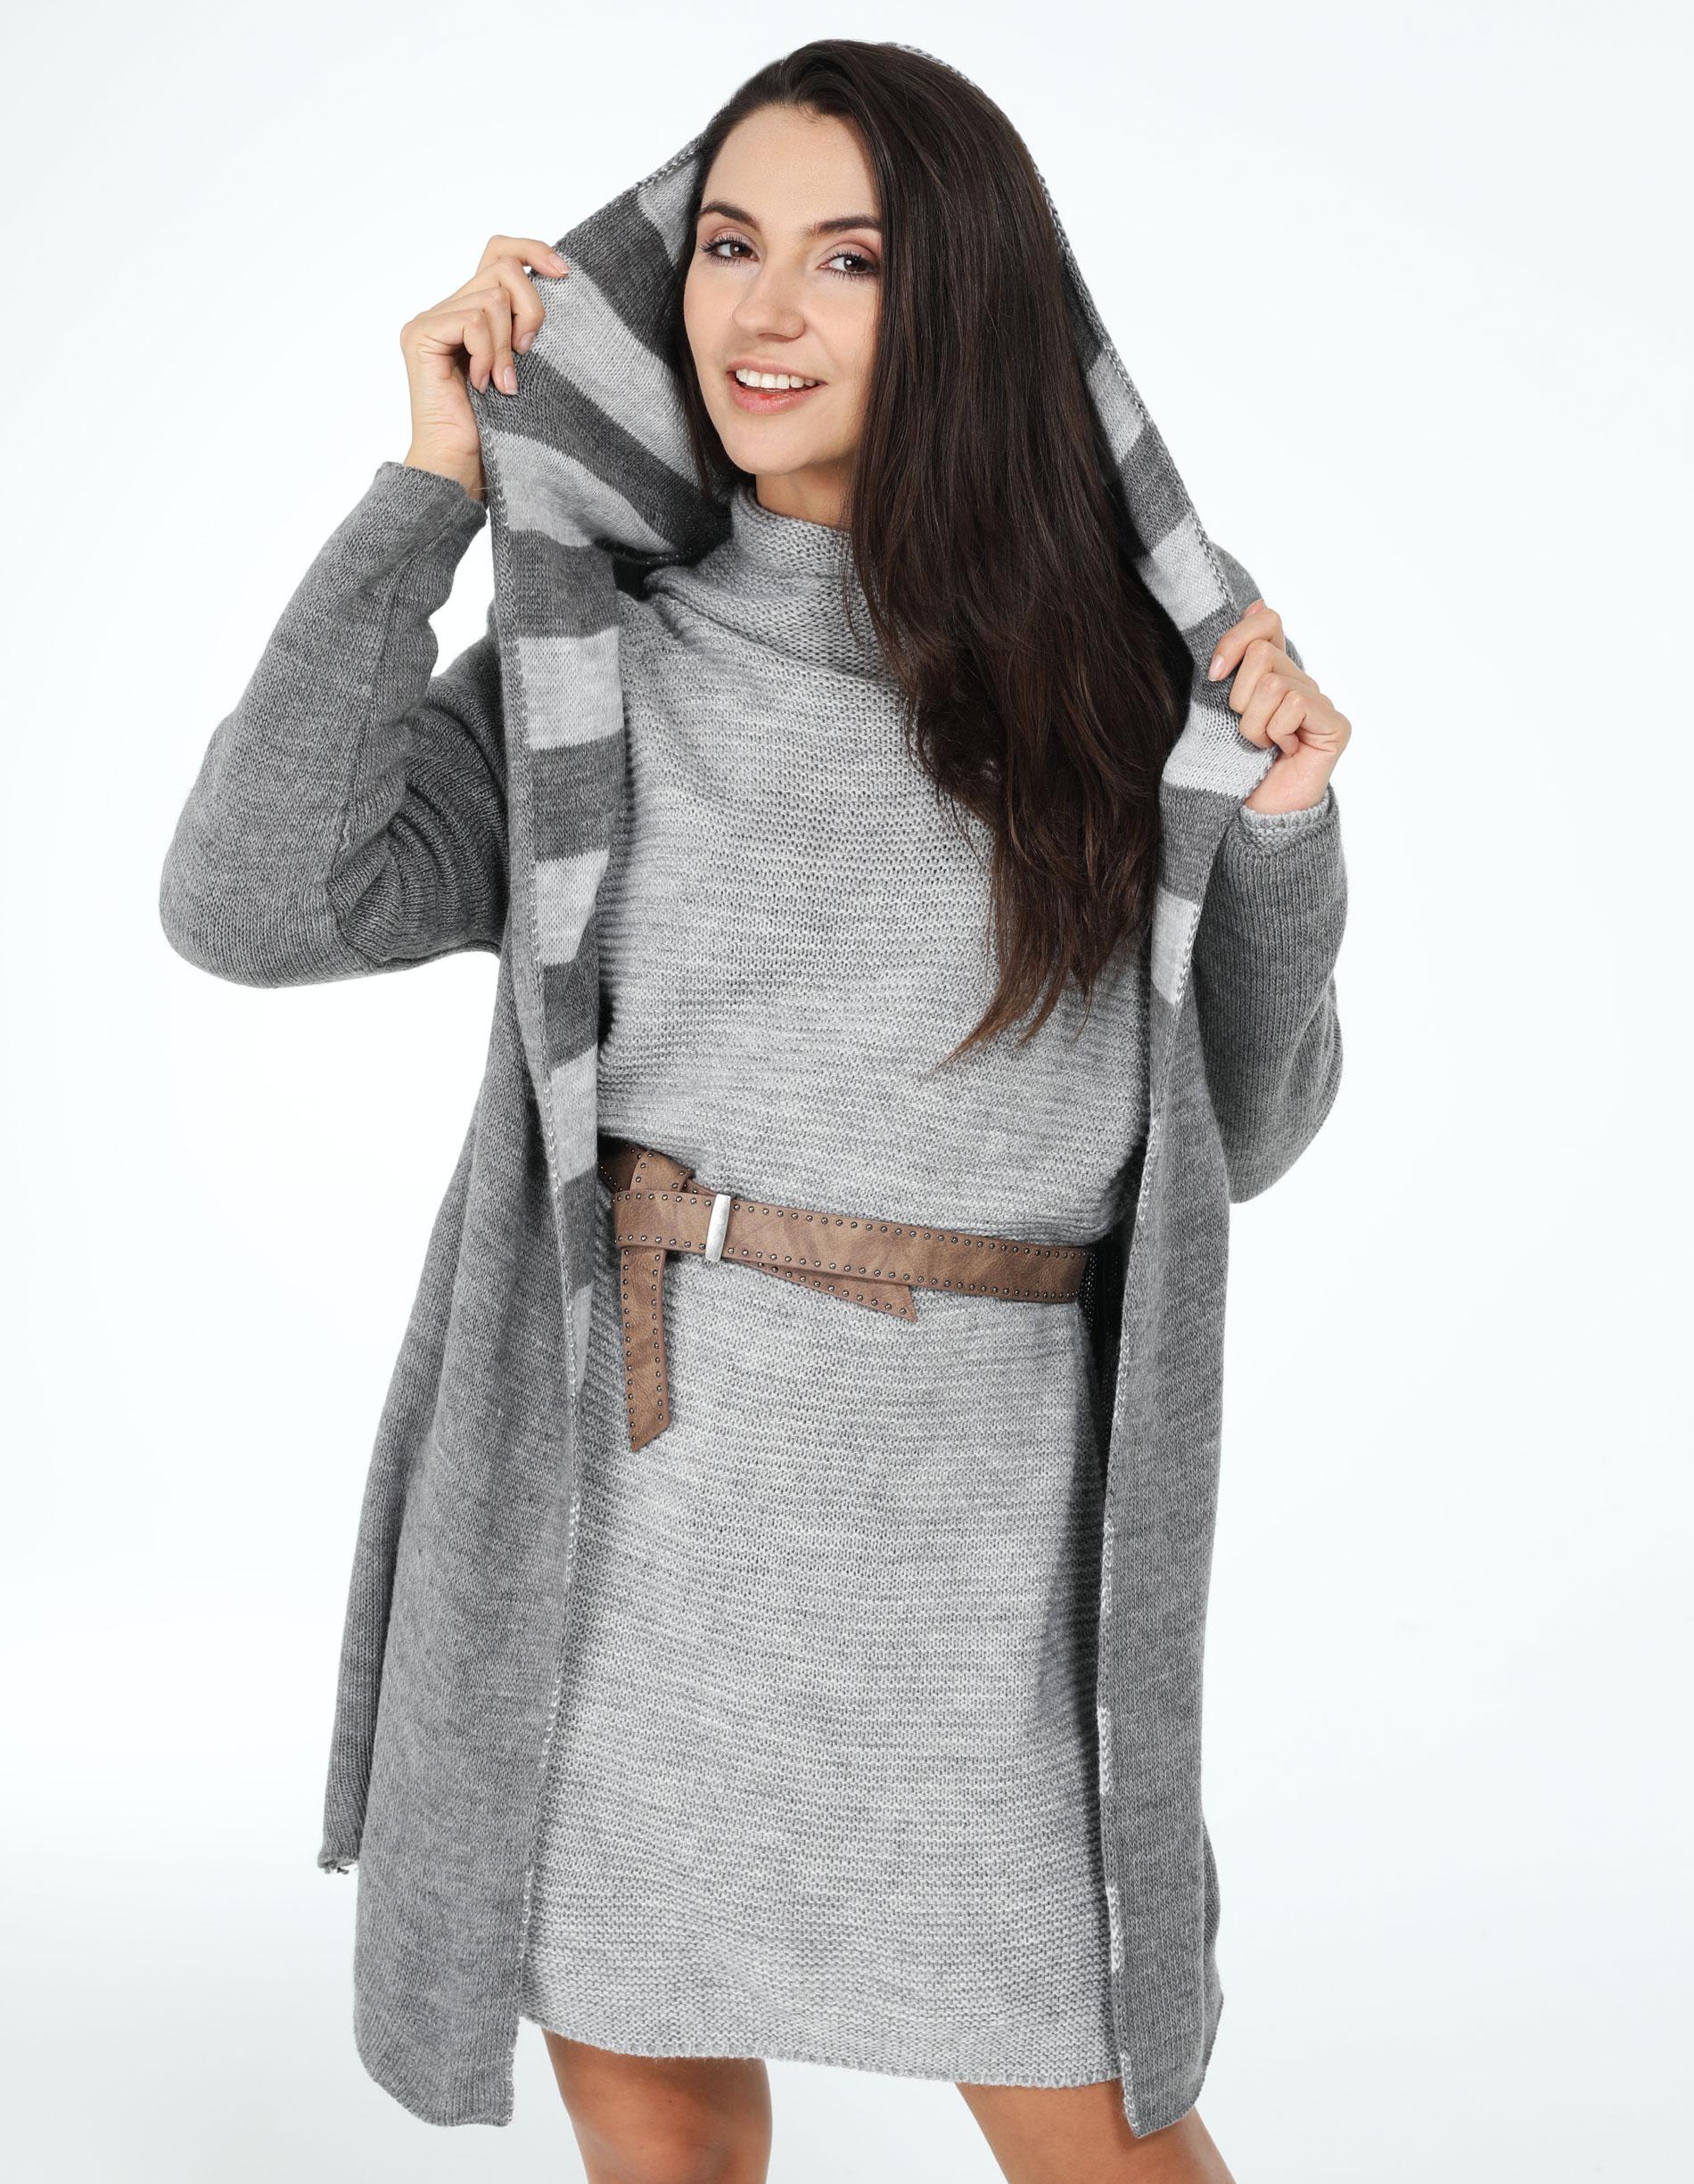 Sweter - 153-903 GRI01 - Unisono